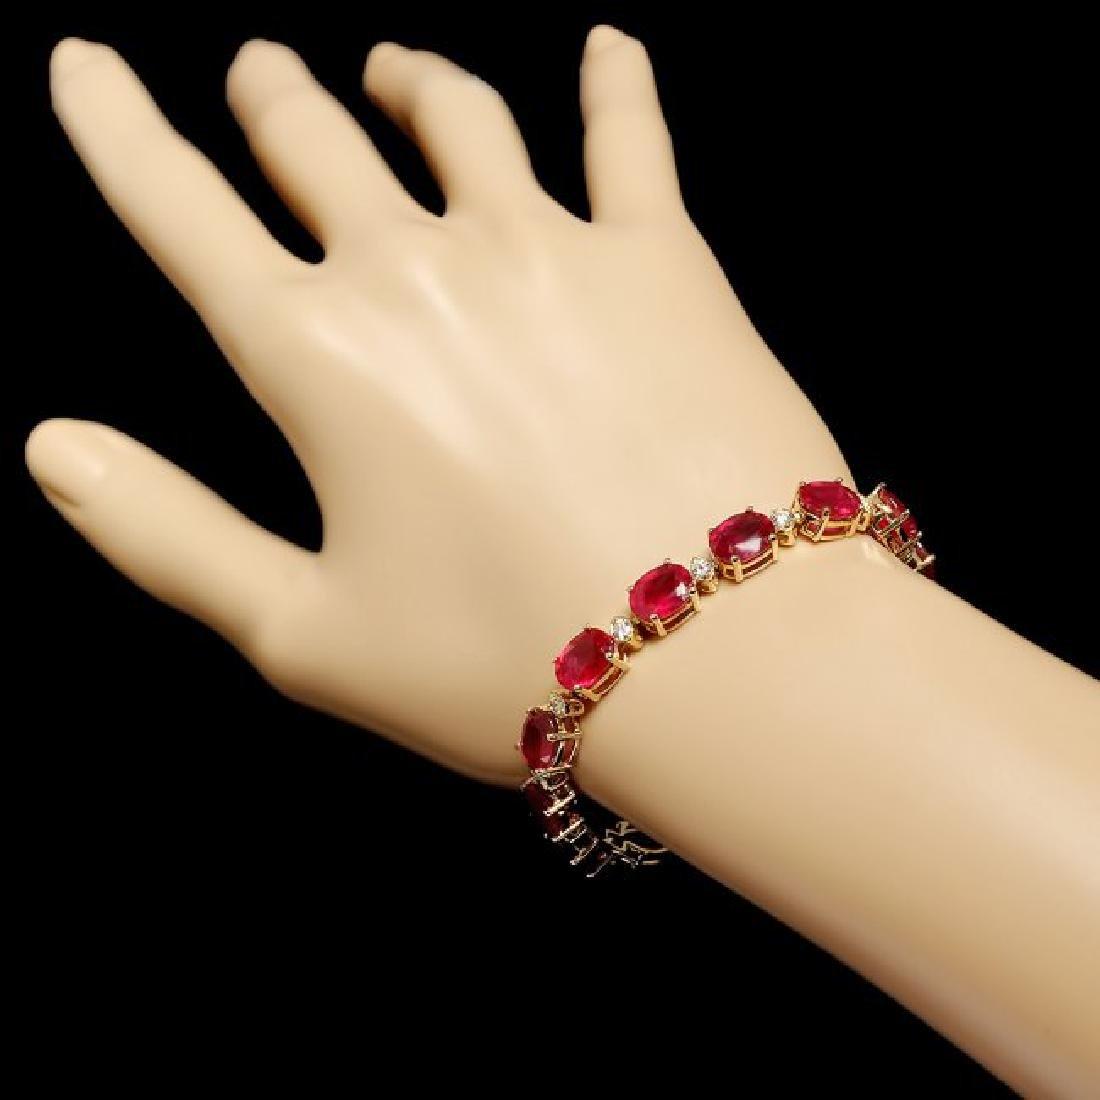 14k Gold 34.50ct Ruby 1.15ct Diamond Bracelet - 4